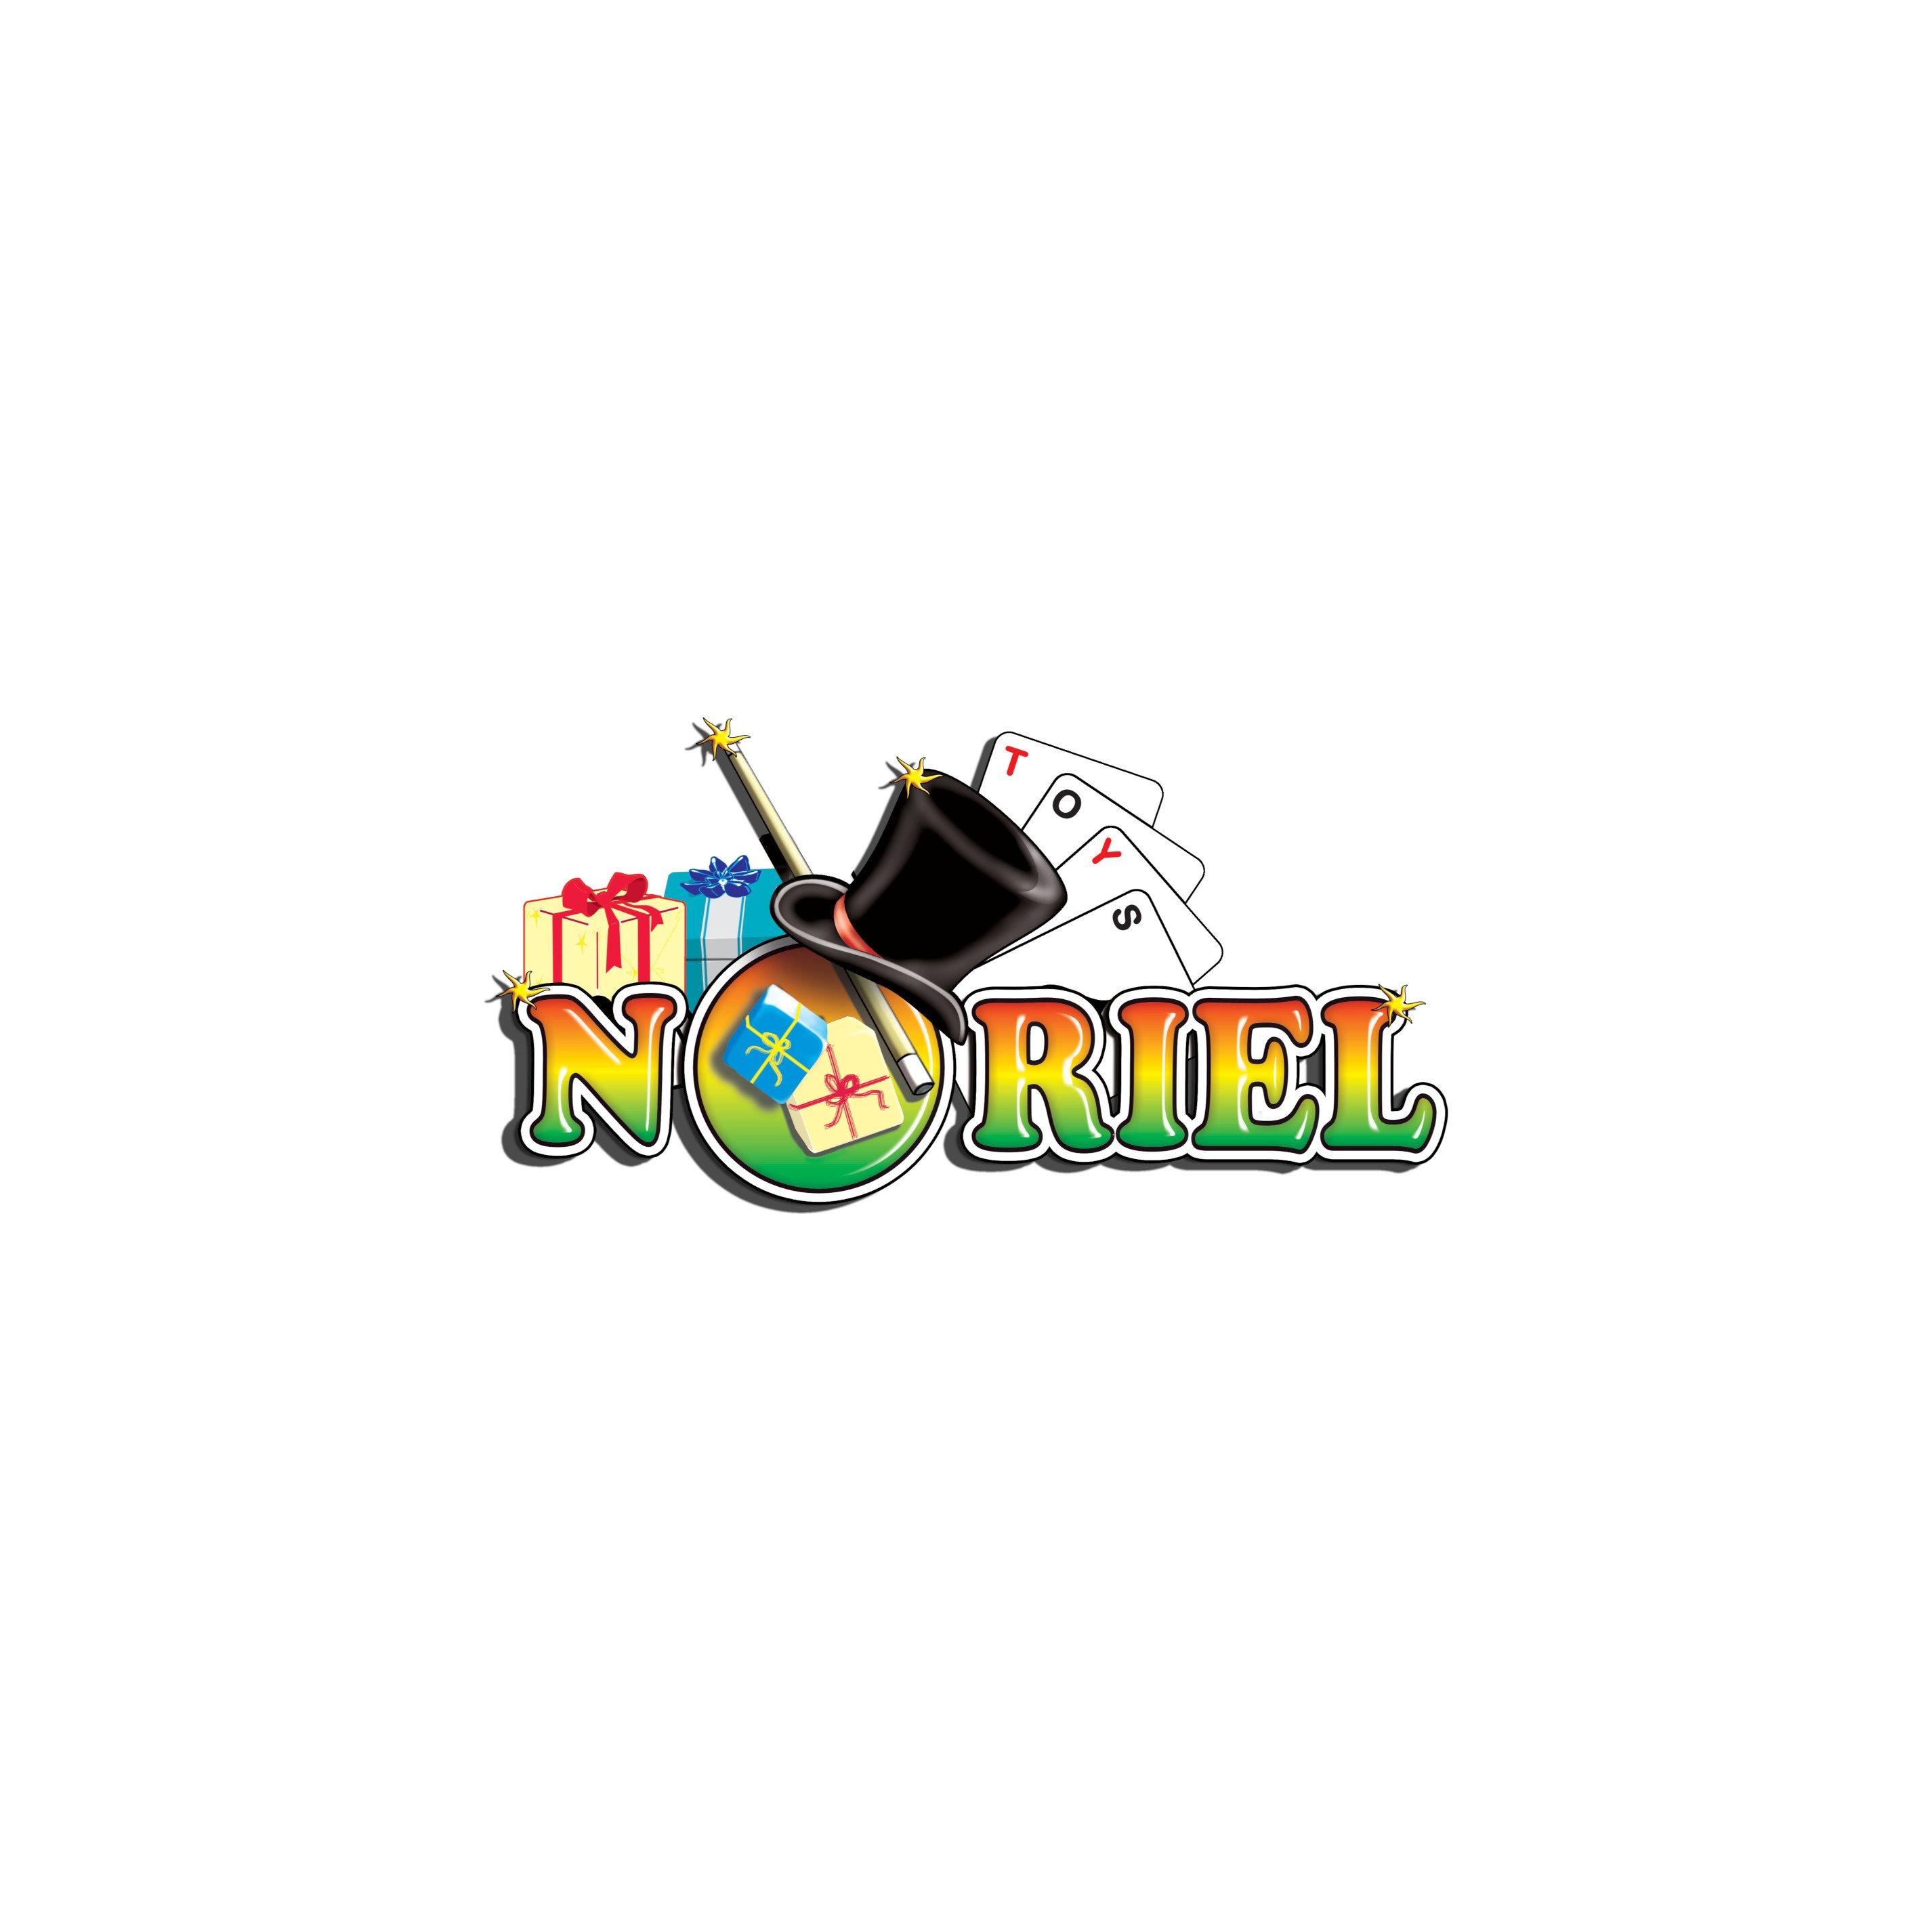 19BS186_001w Set lenjerie Disney Cars, 2 piese